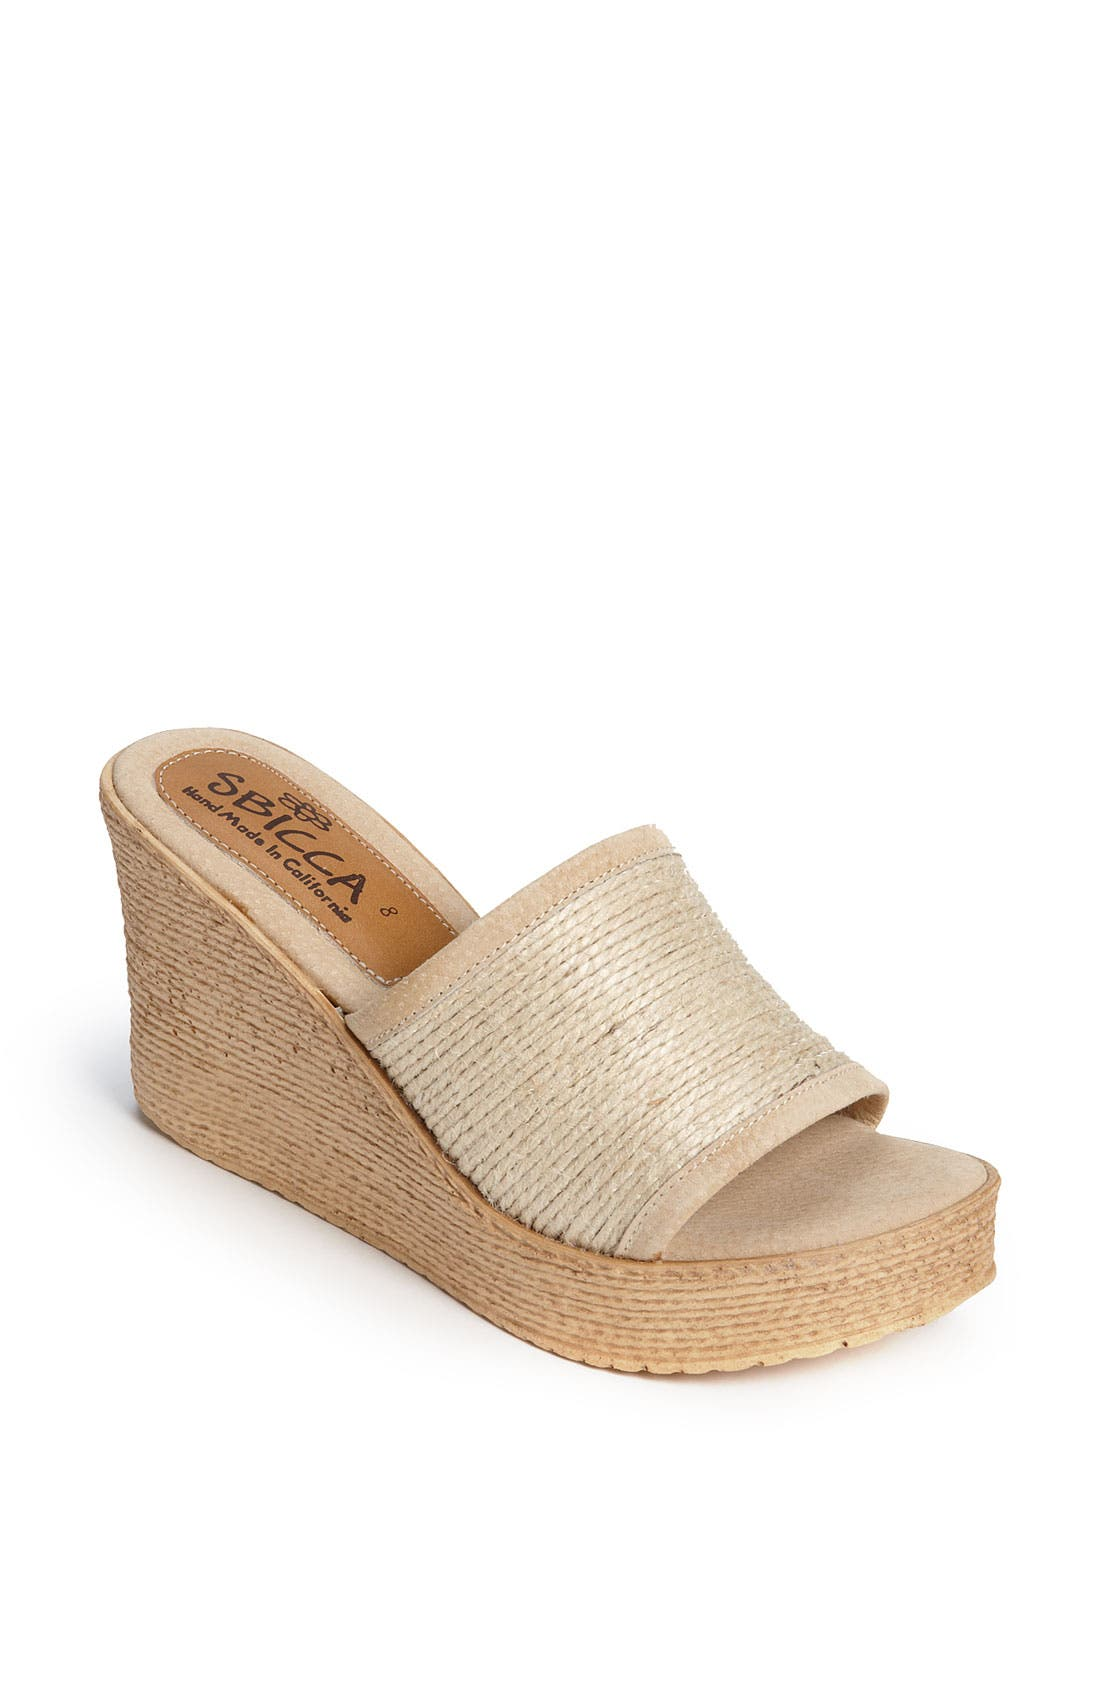 Main Image - Sbicca 'Blondie' Sandal